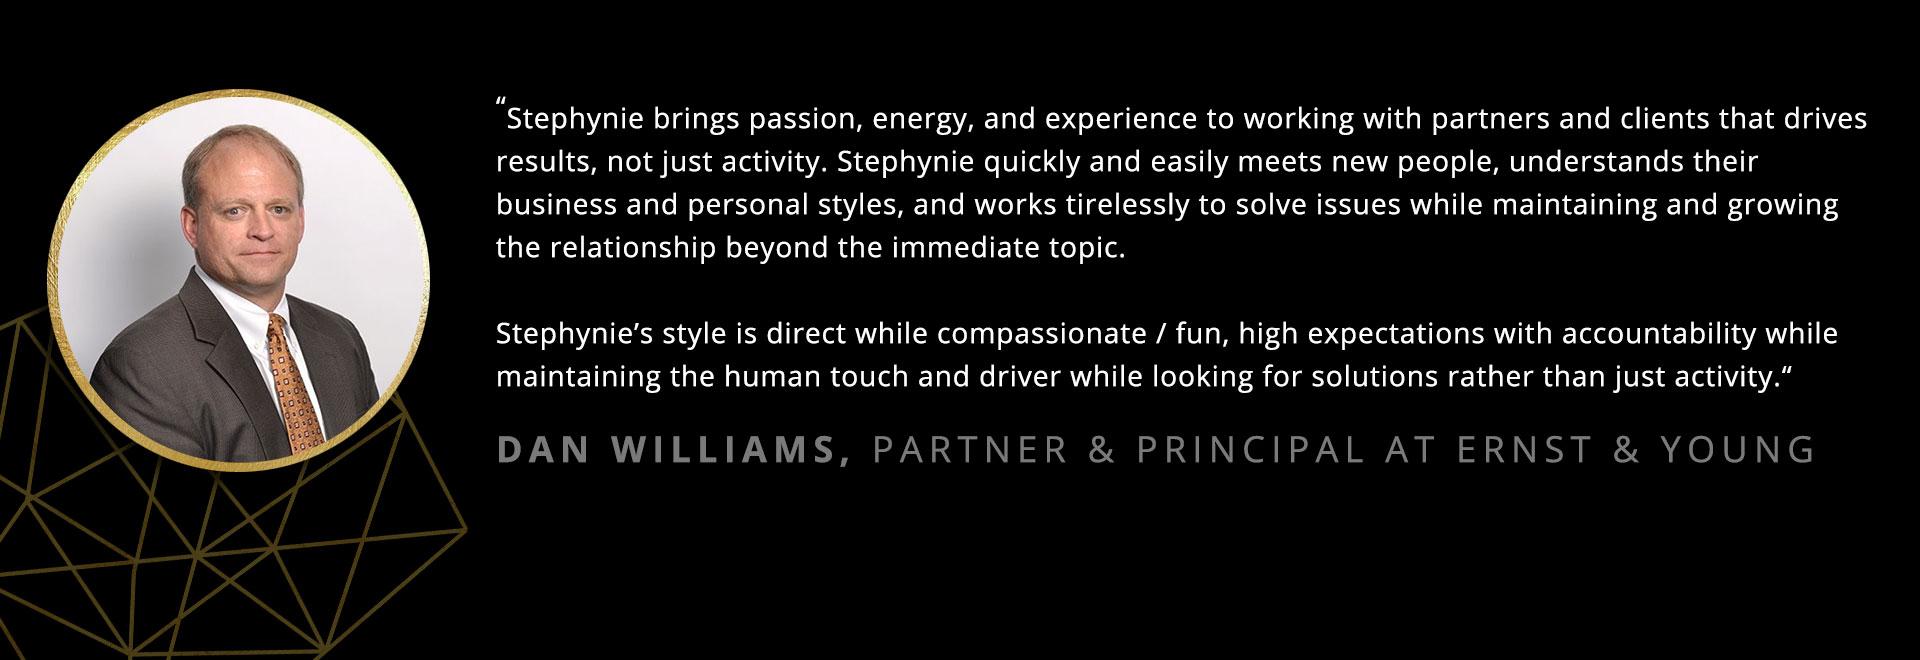 Testimonial_Williams.jpg